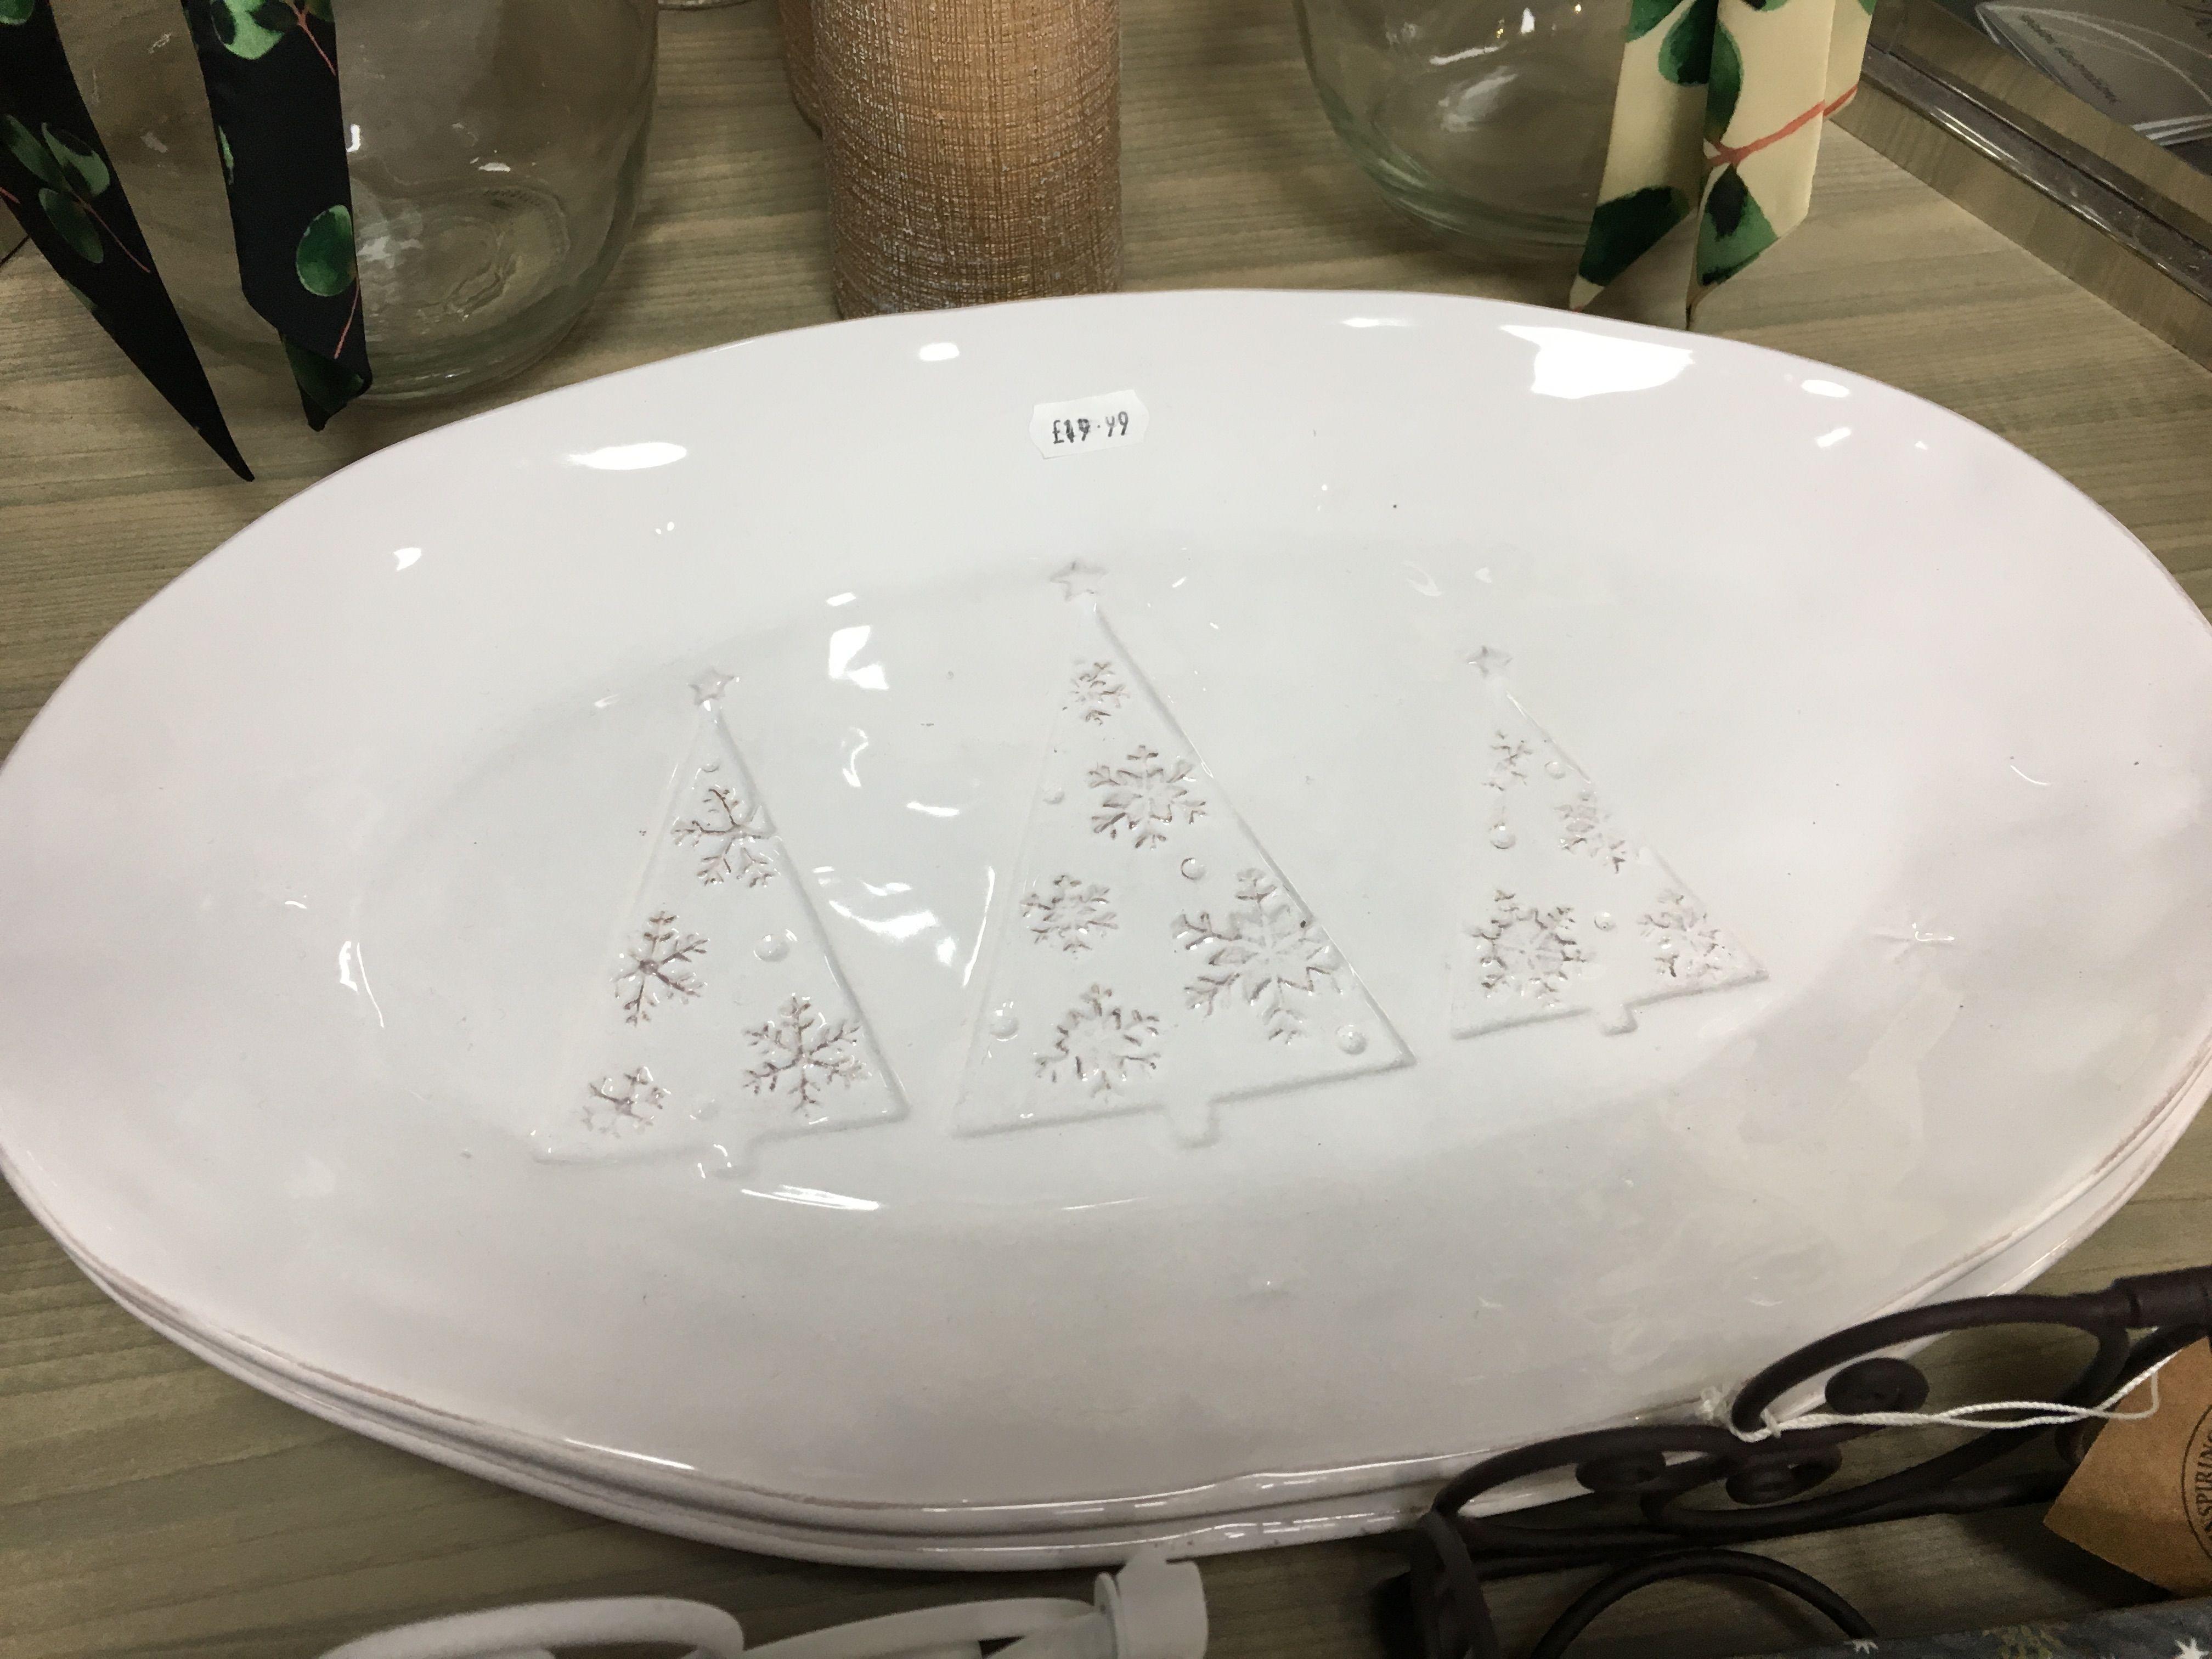 Chritsmas serving plate 1999 serving plates serving